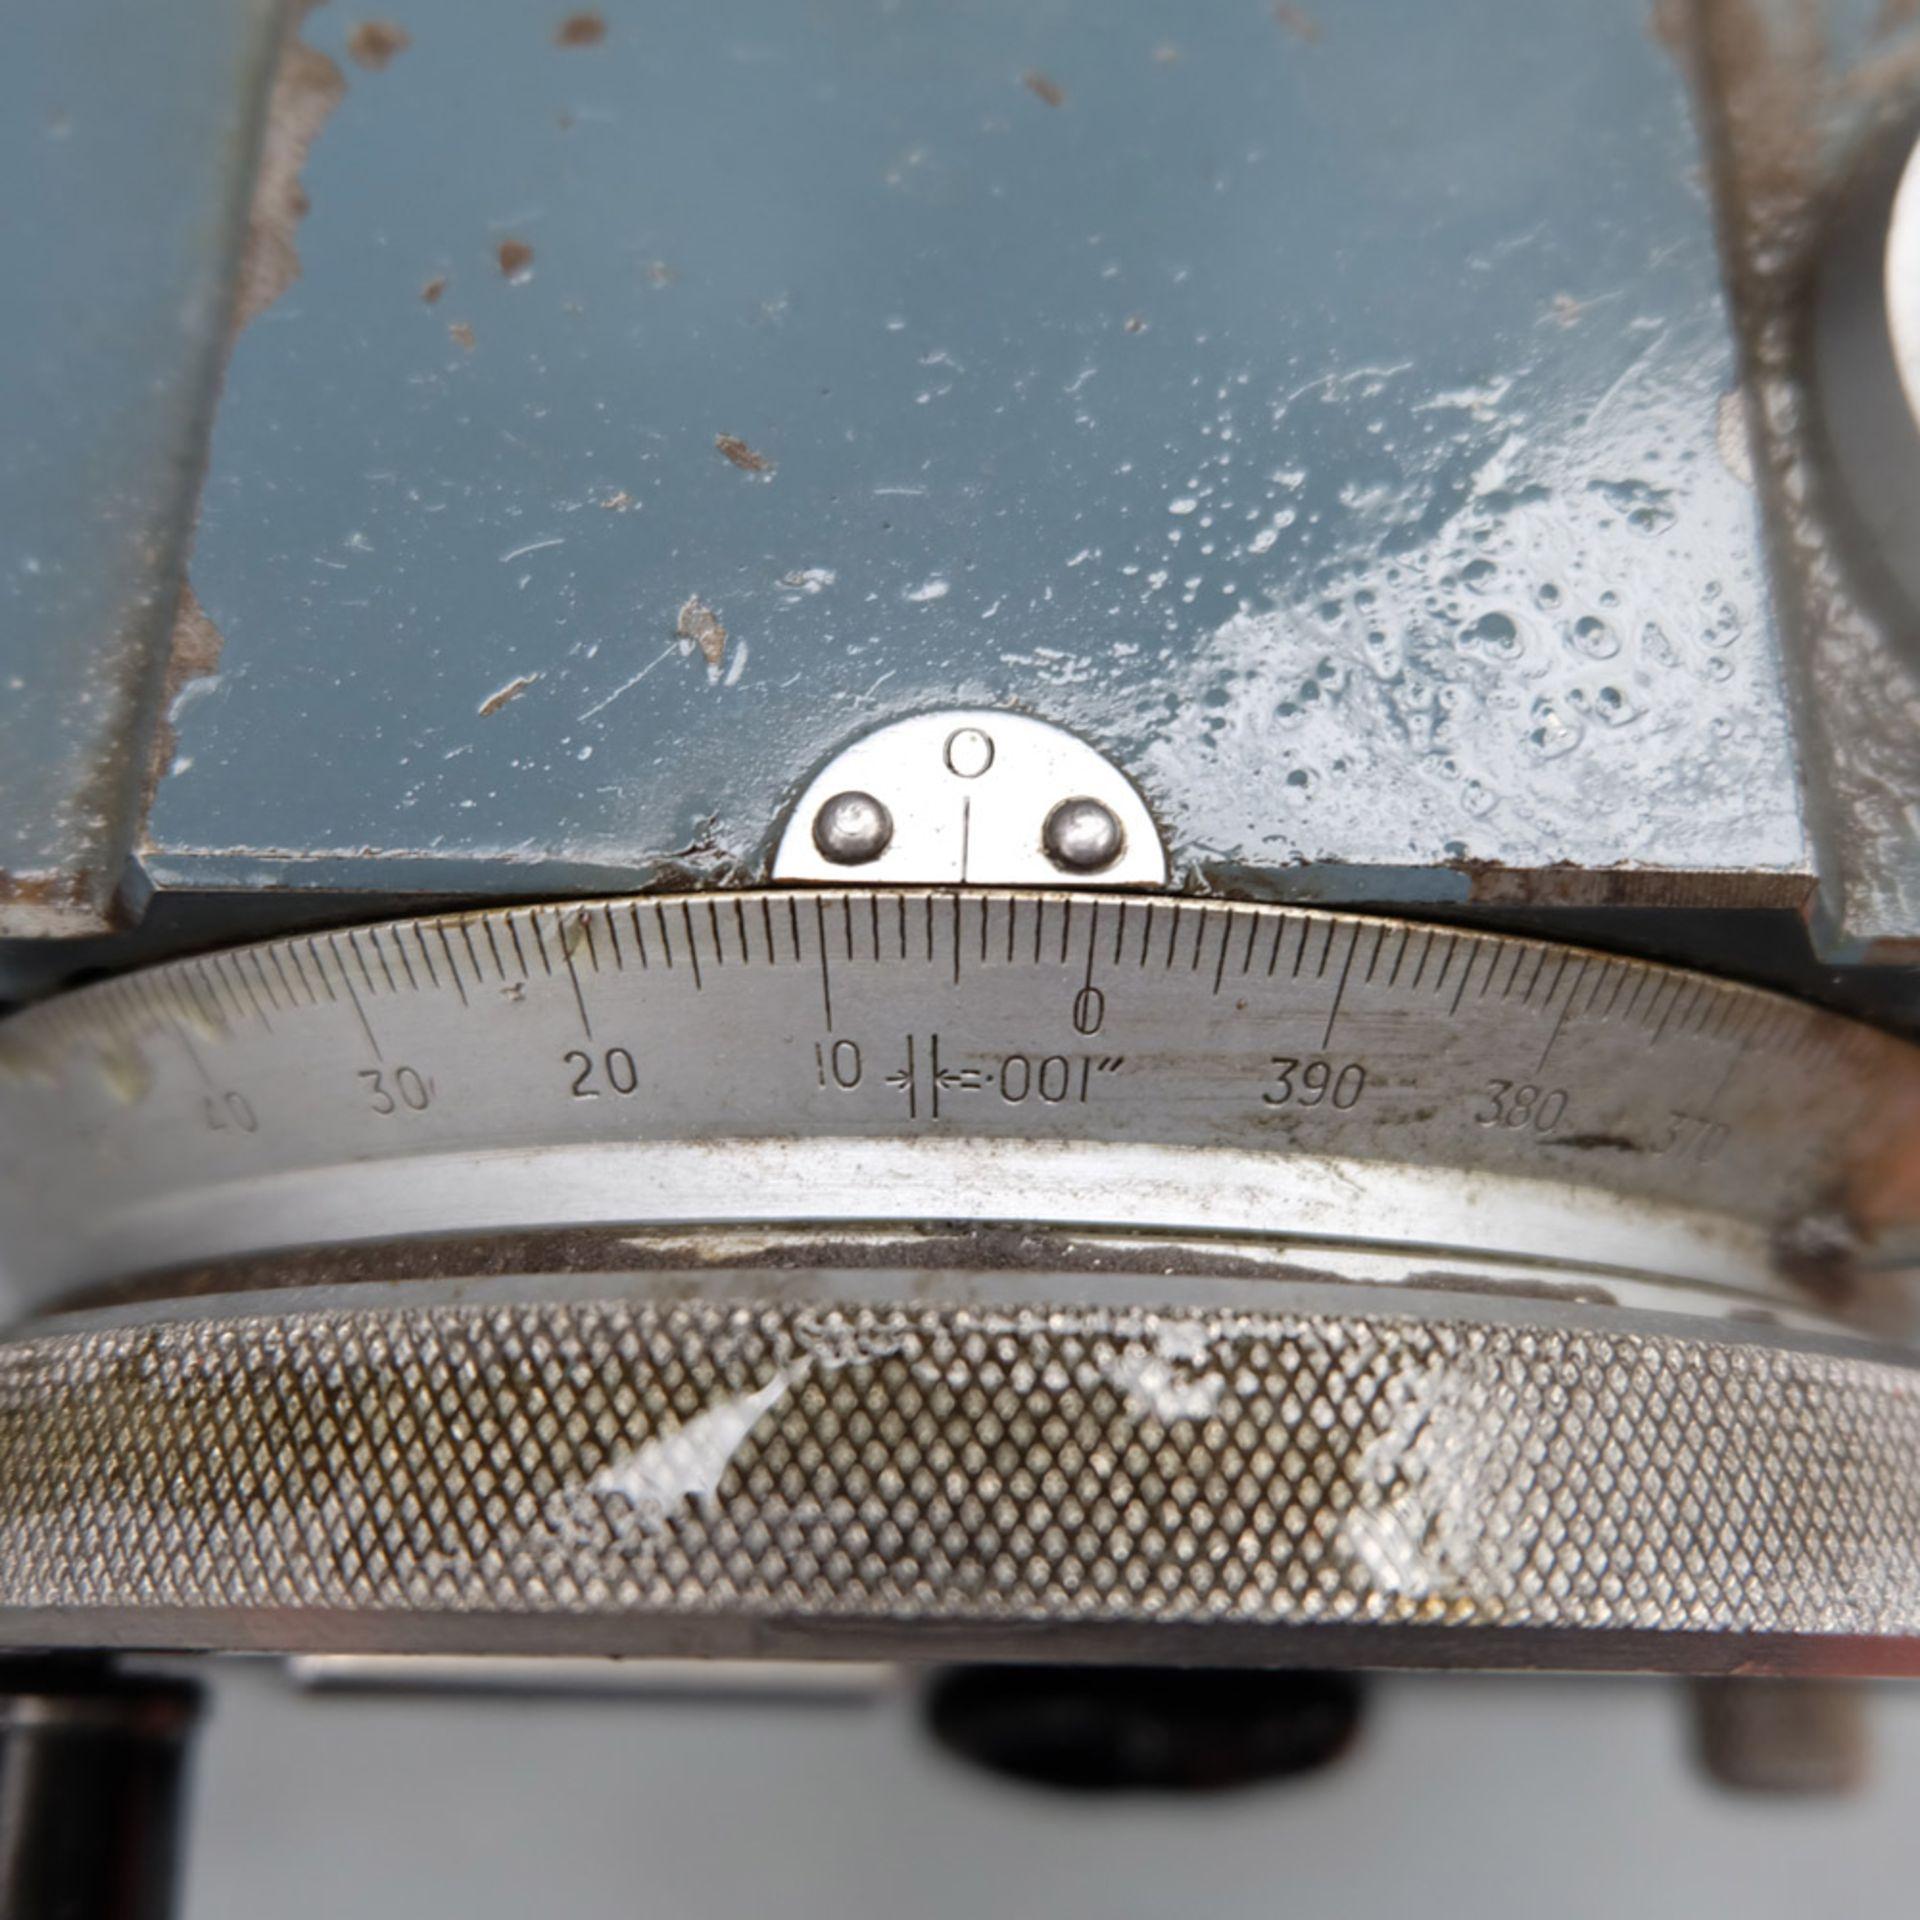 Jones & Shipman 540P Toolroom Surface Grinder. - Image 7 of 7